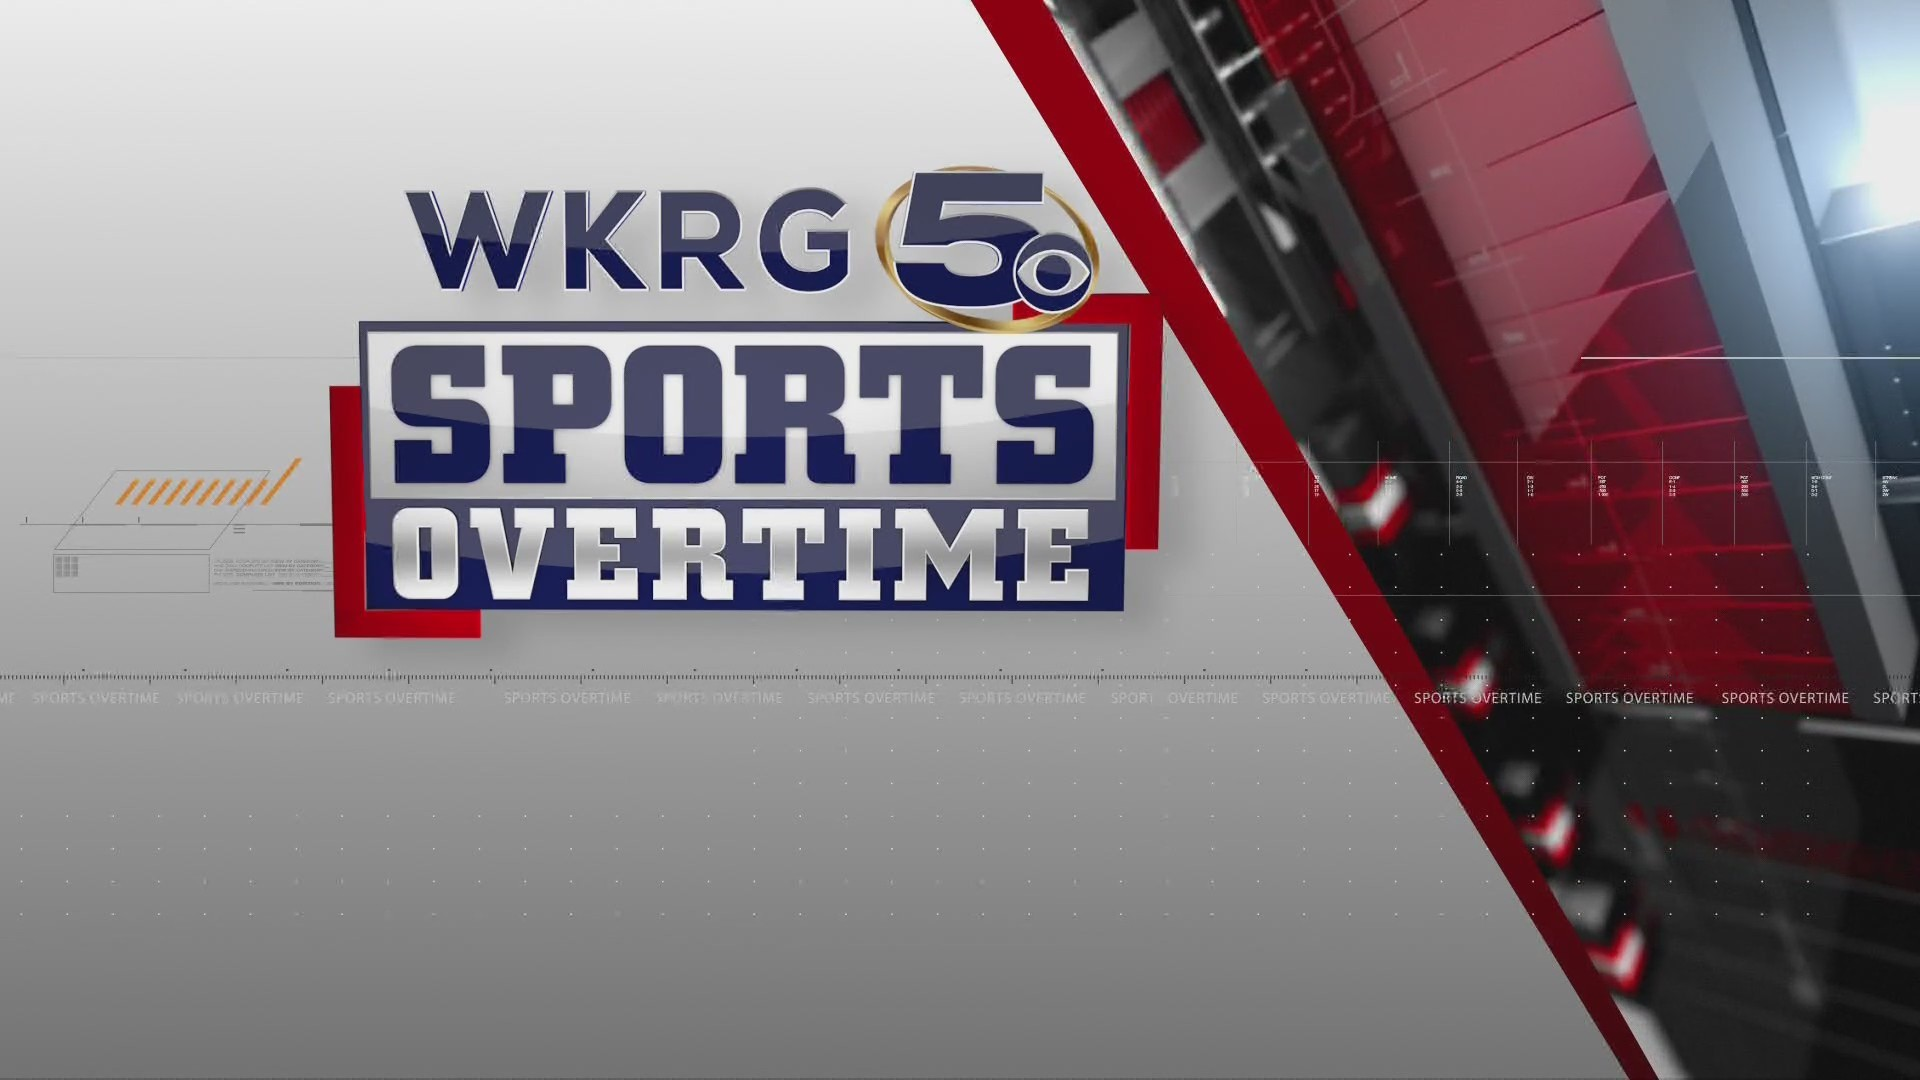 WKRG NEWS 5 - Sports Overtime - 02/10/2019